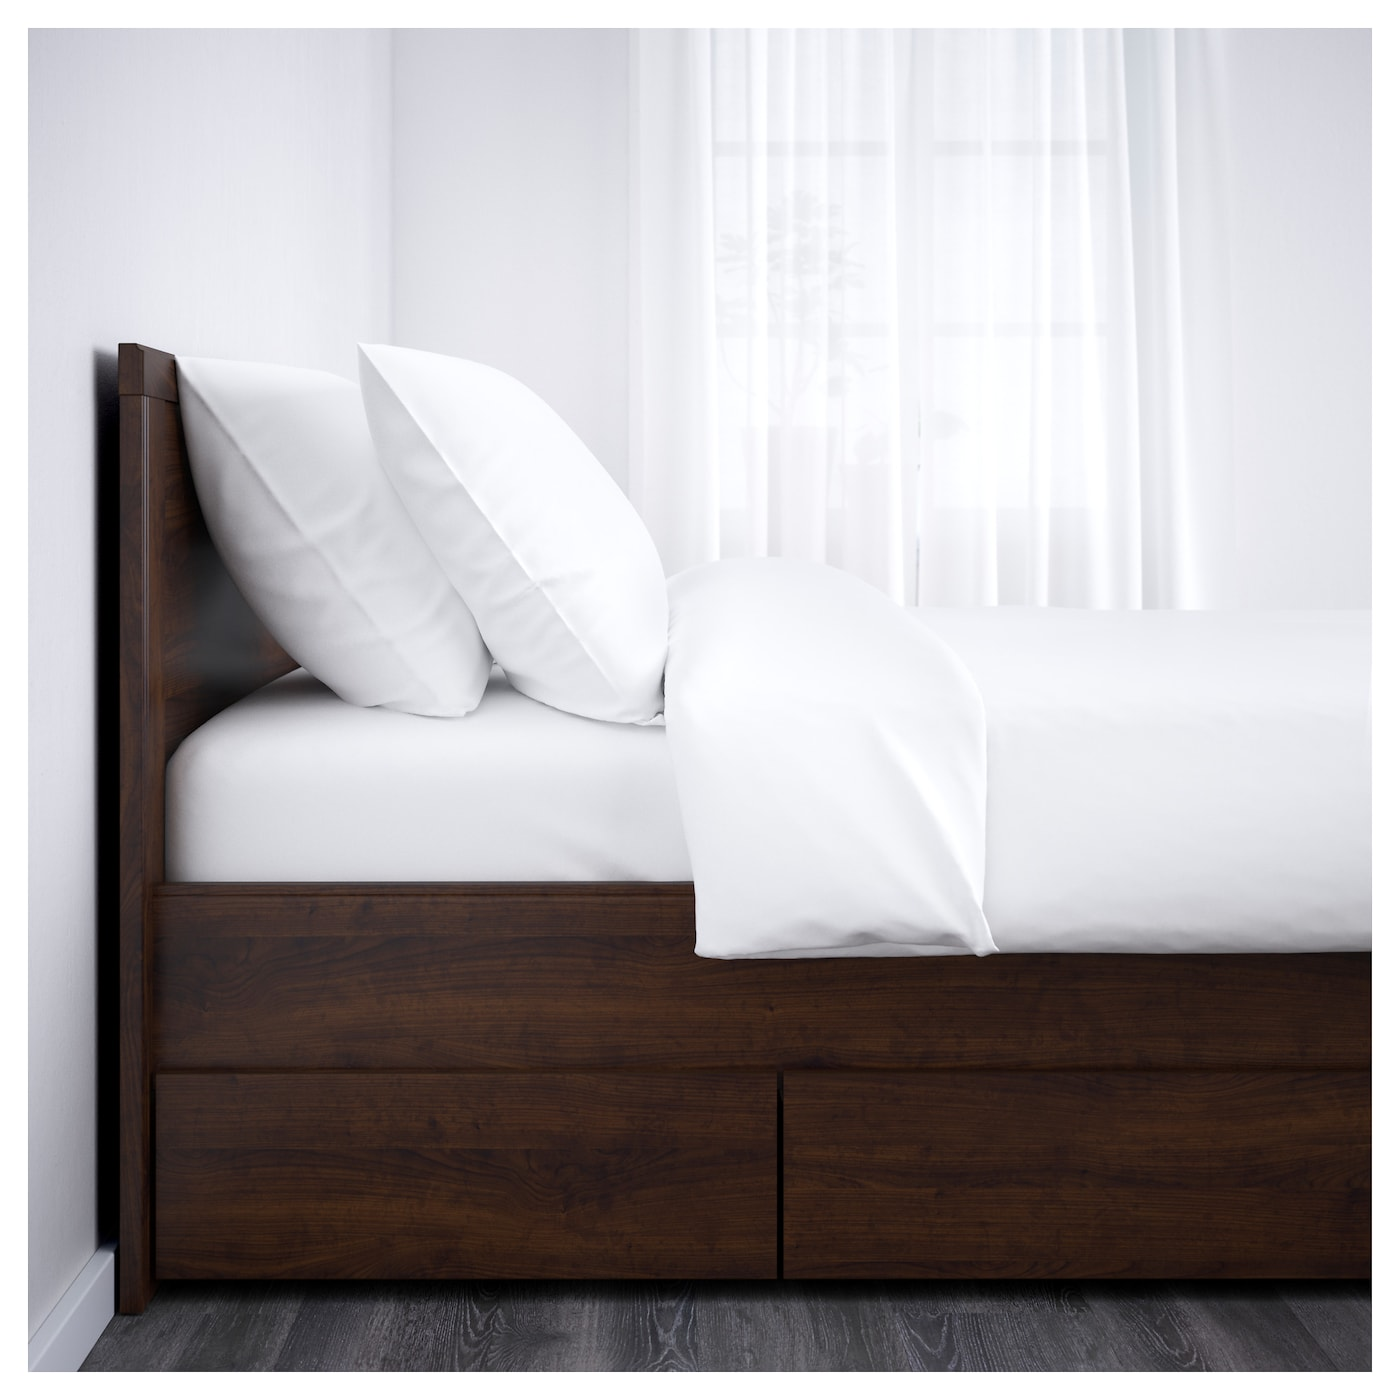 Brusali Bed Frame With 4 Storage Boxes Brown Lur 246 Y